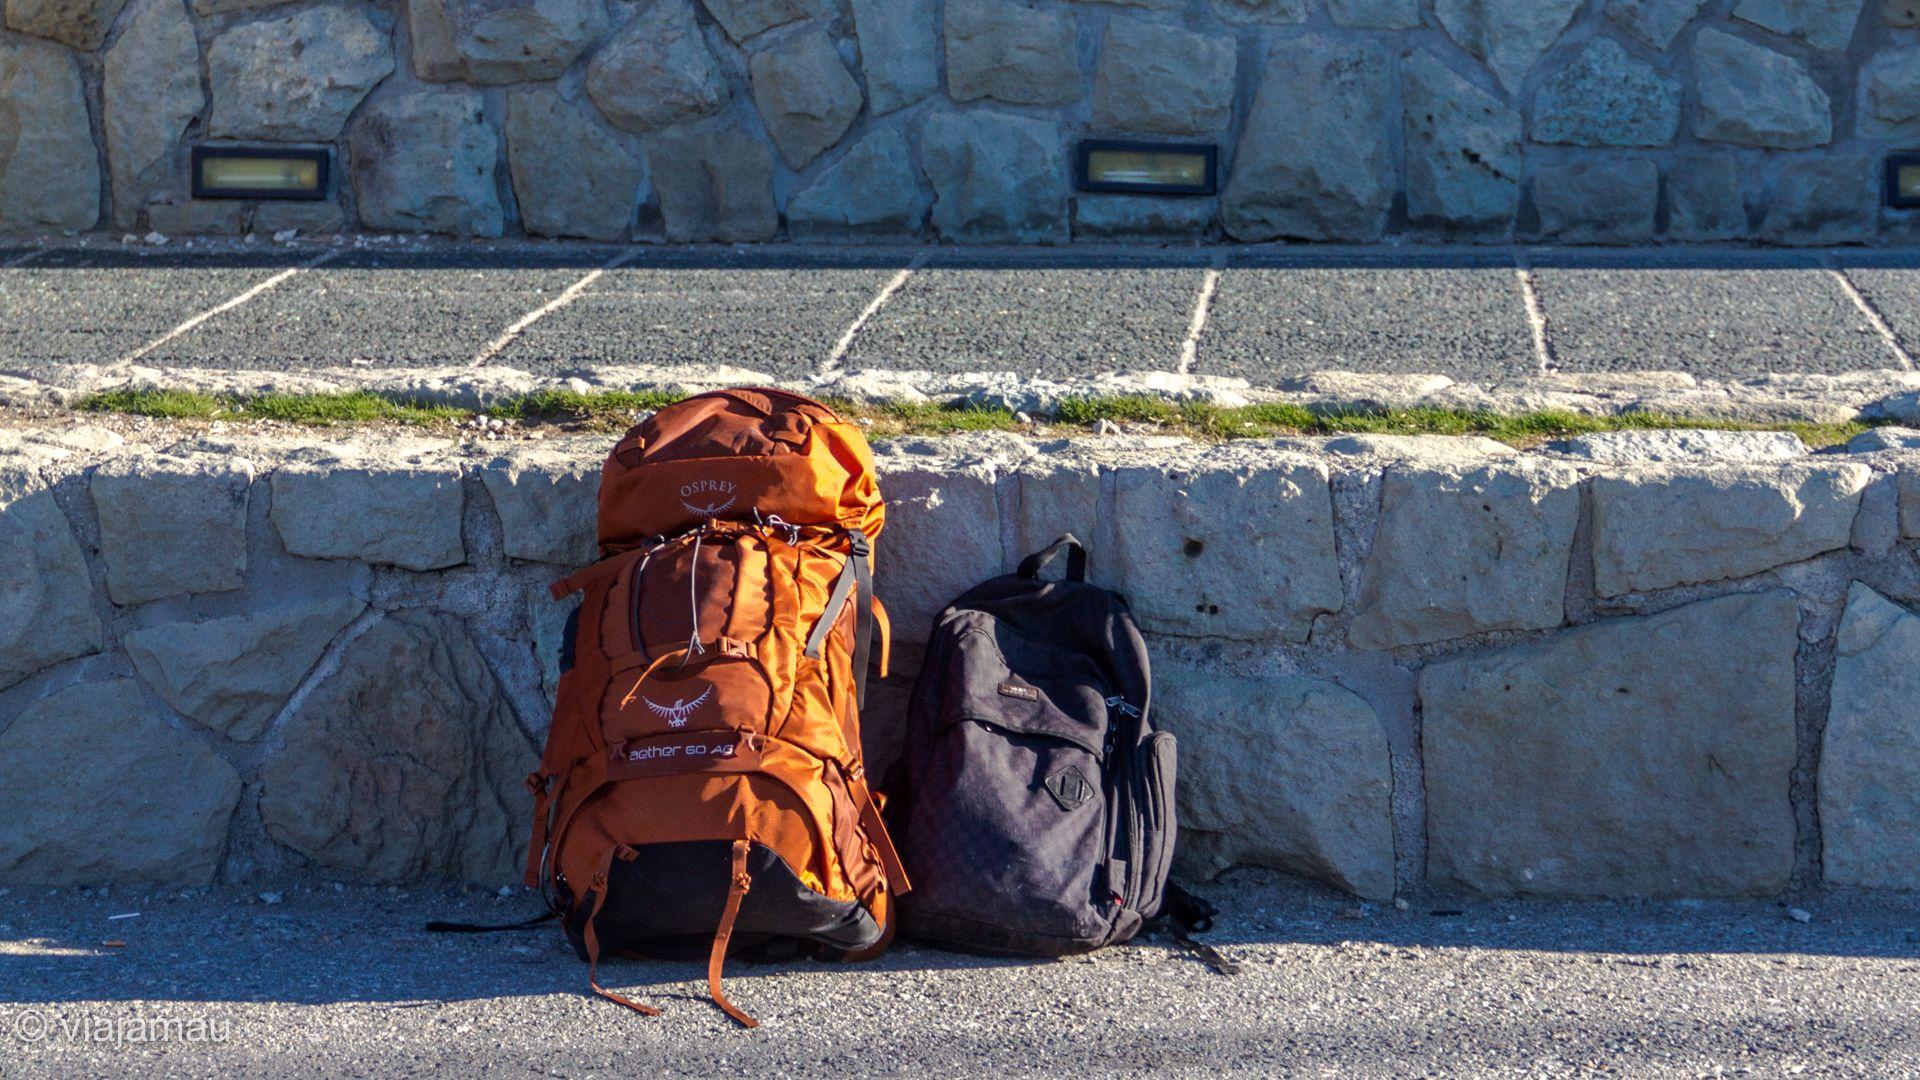 Mochilas listas para viajar